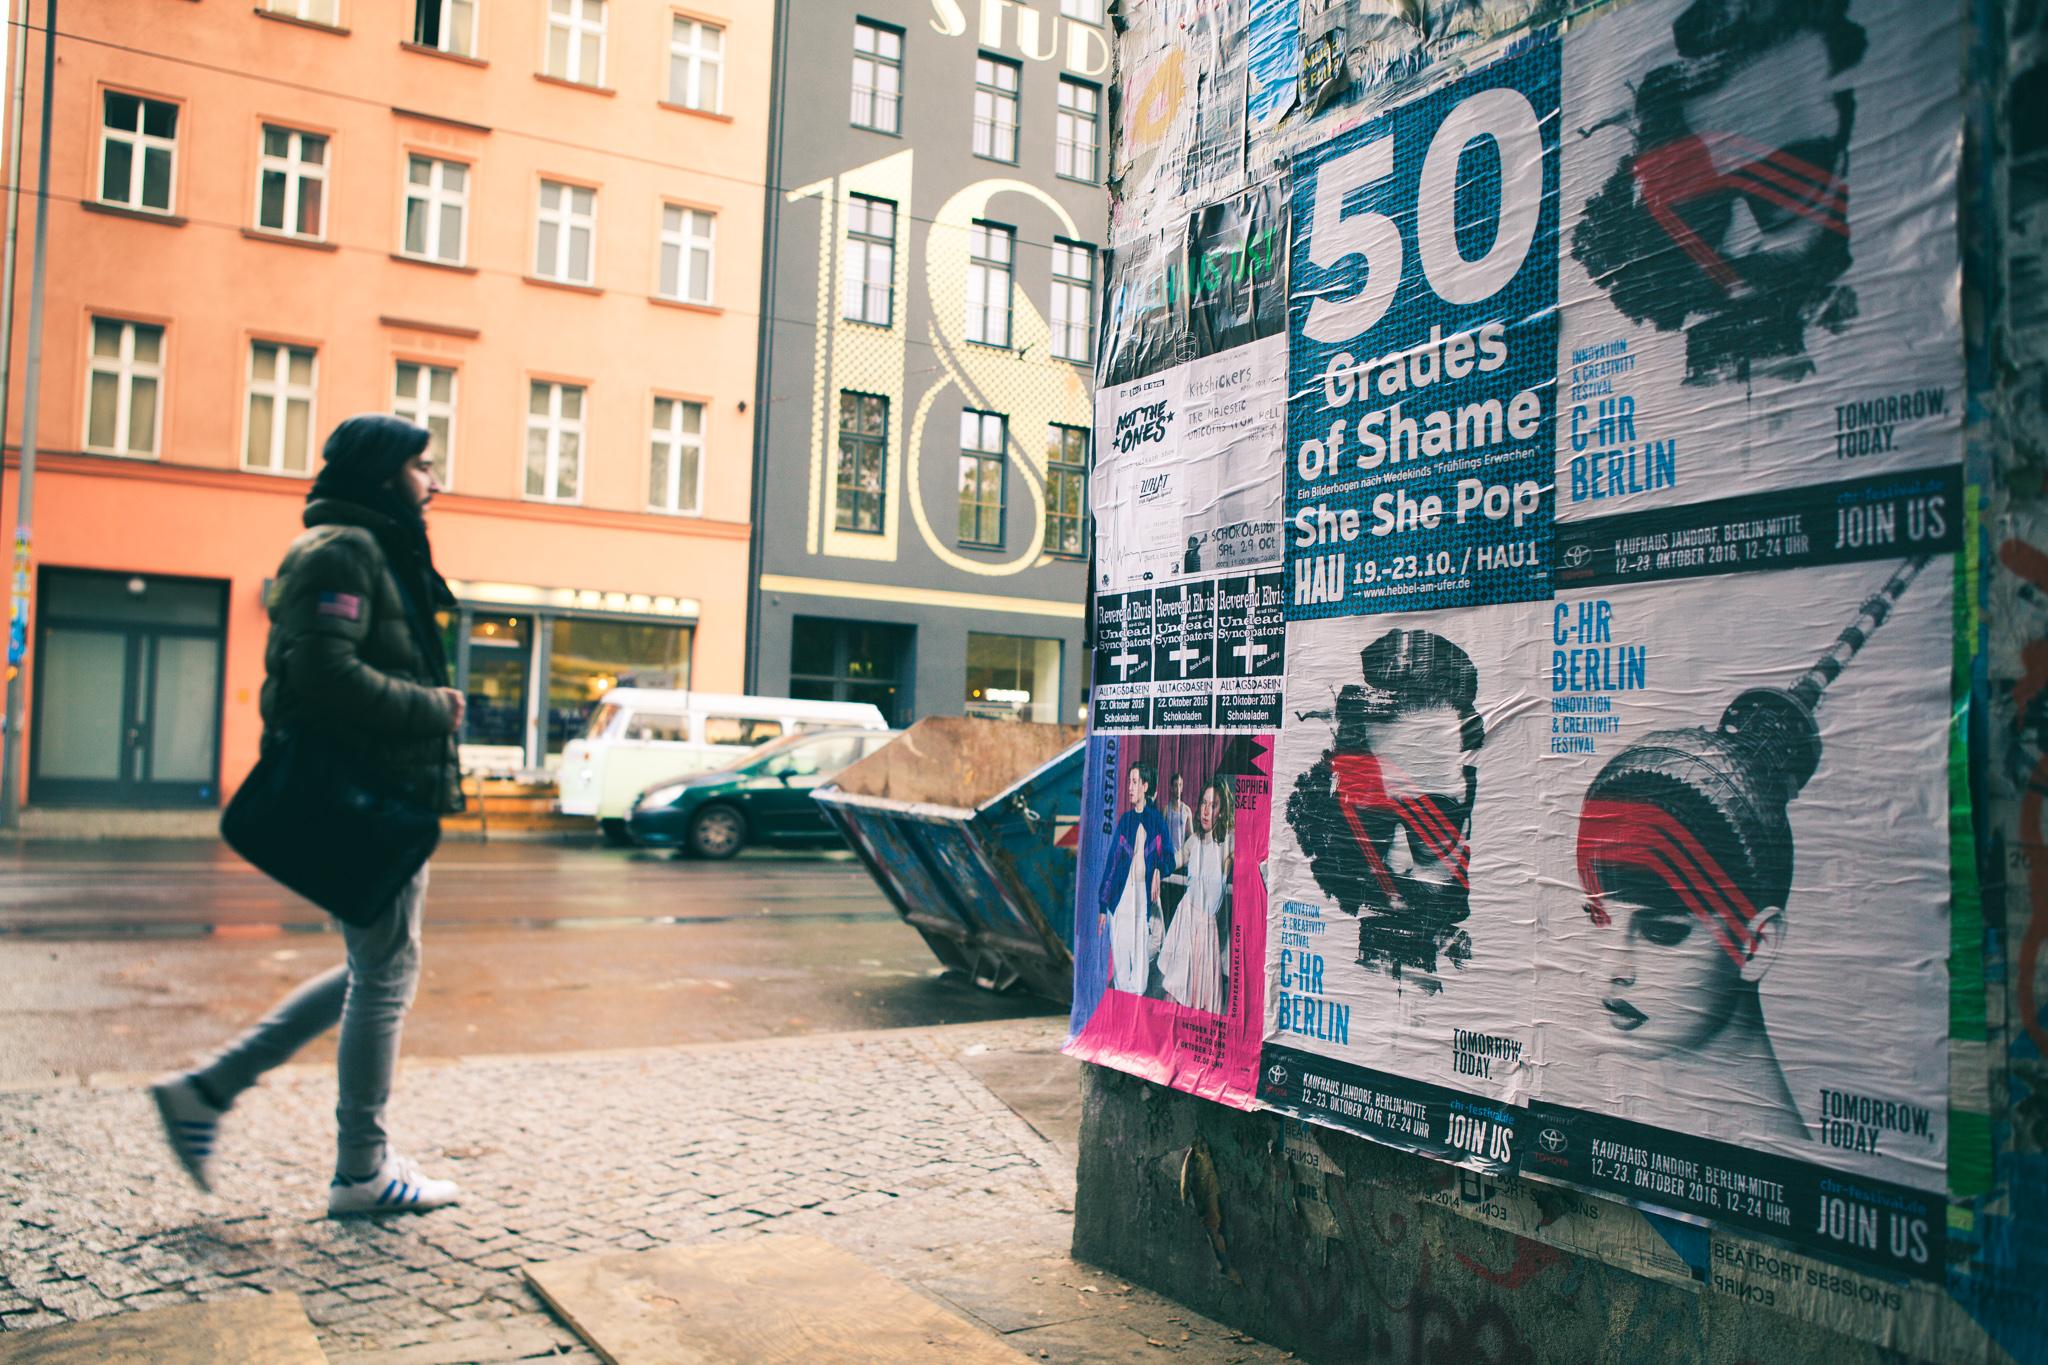 C-HR_BERLIN_Festival-0045.jpg